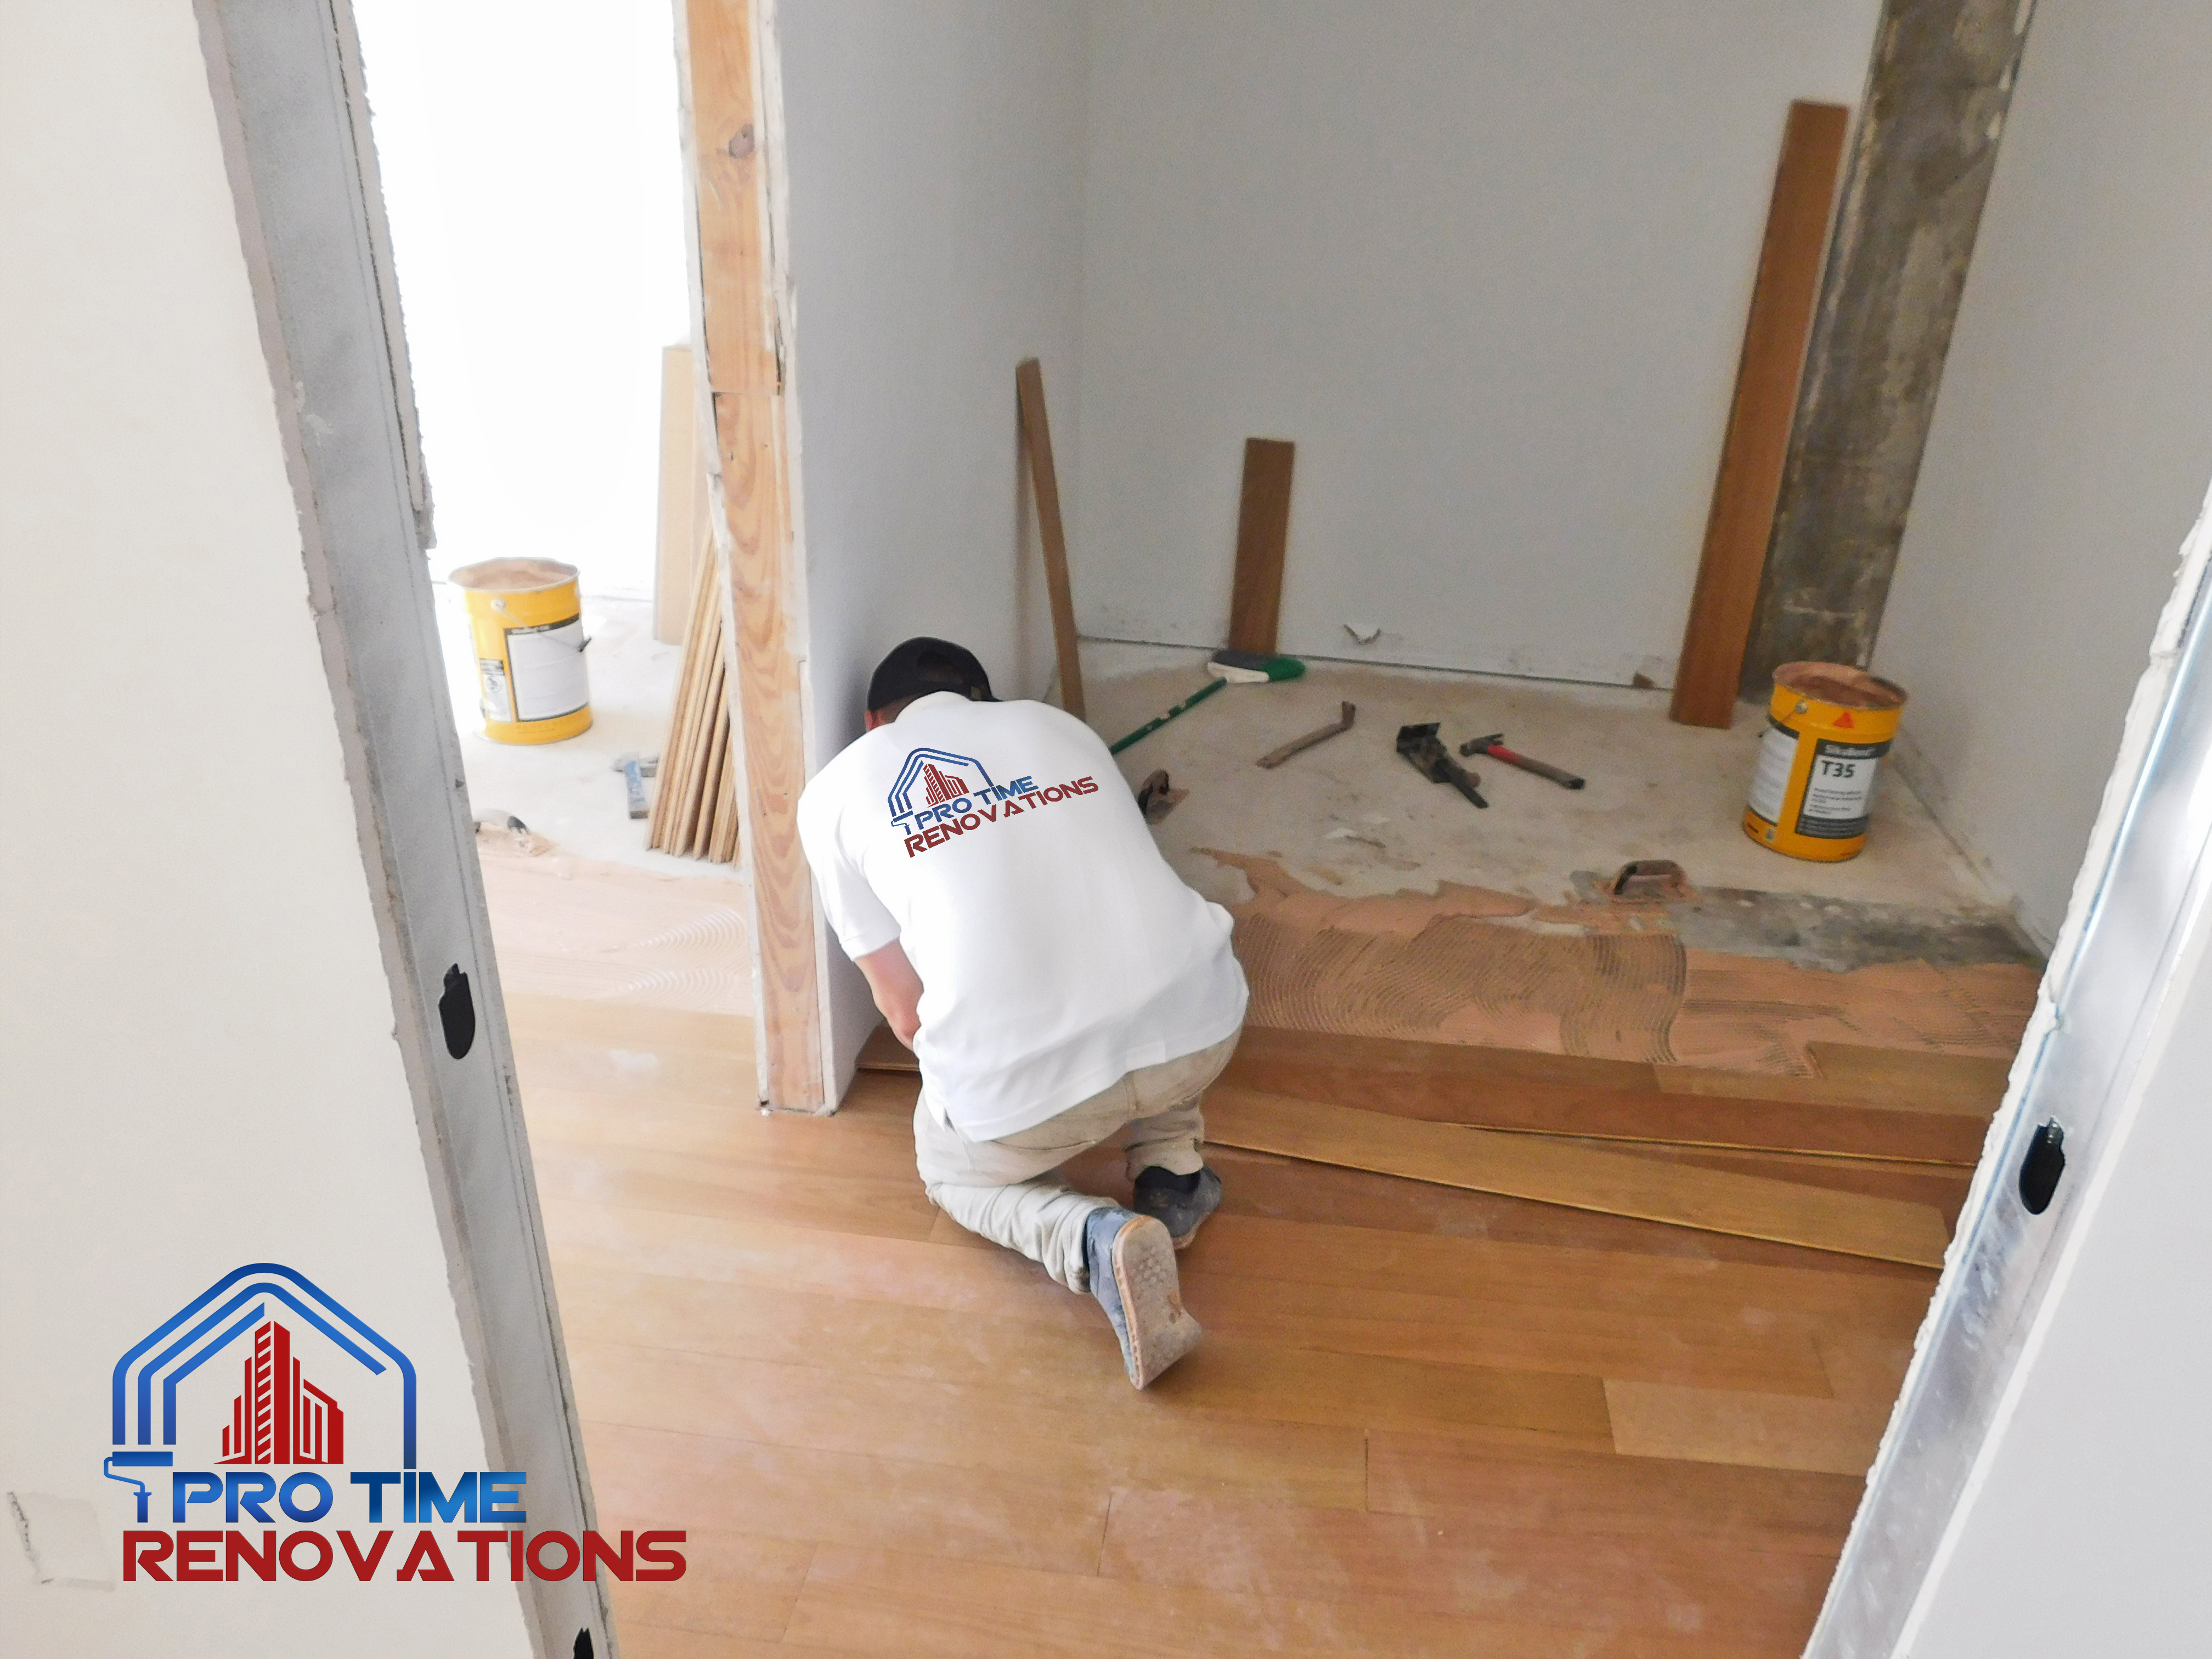 ProTime-Renovations-Philadelphia1-2